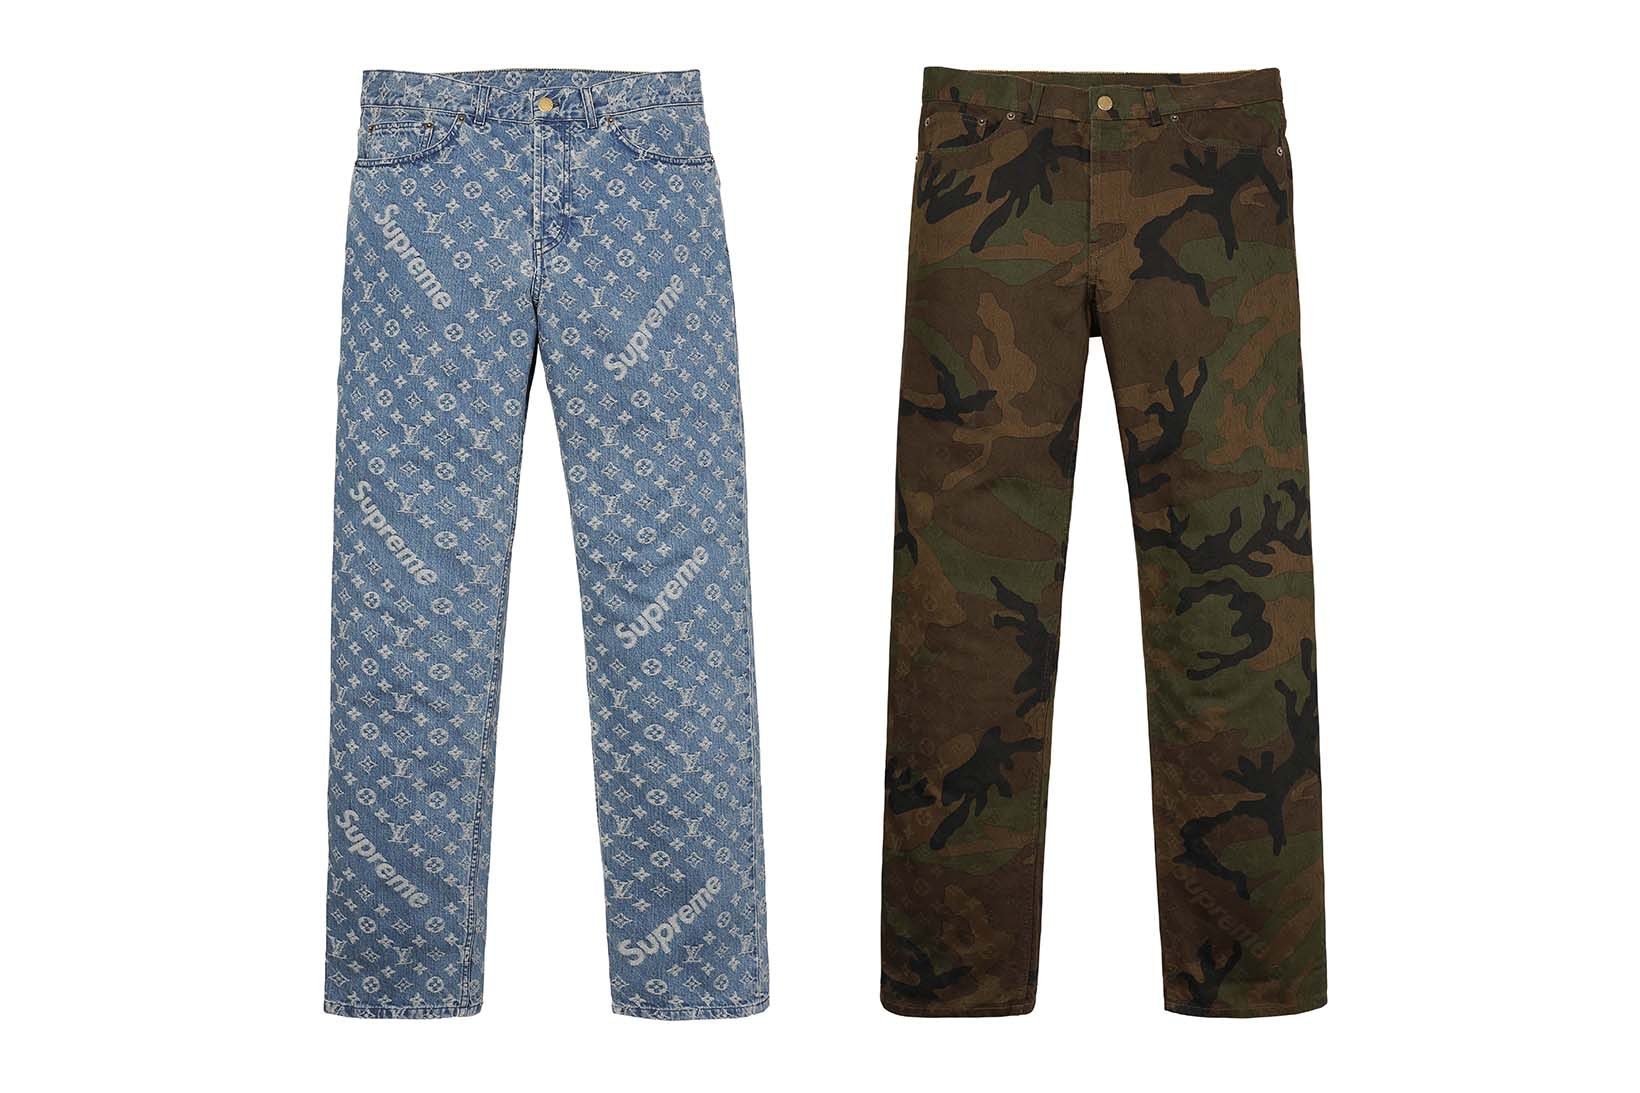 Supreme(シュプリーム)×Louis Vuitton(ルイ・ヴィトン) / ジャカード デニム 5ポケット ジーンズ(Jacquard Denim 5-Pocket Jean)